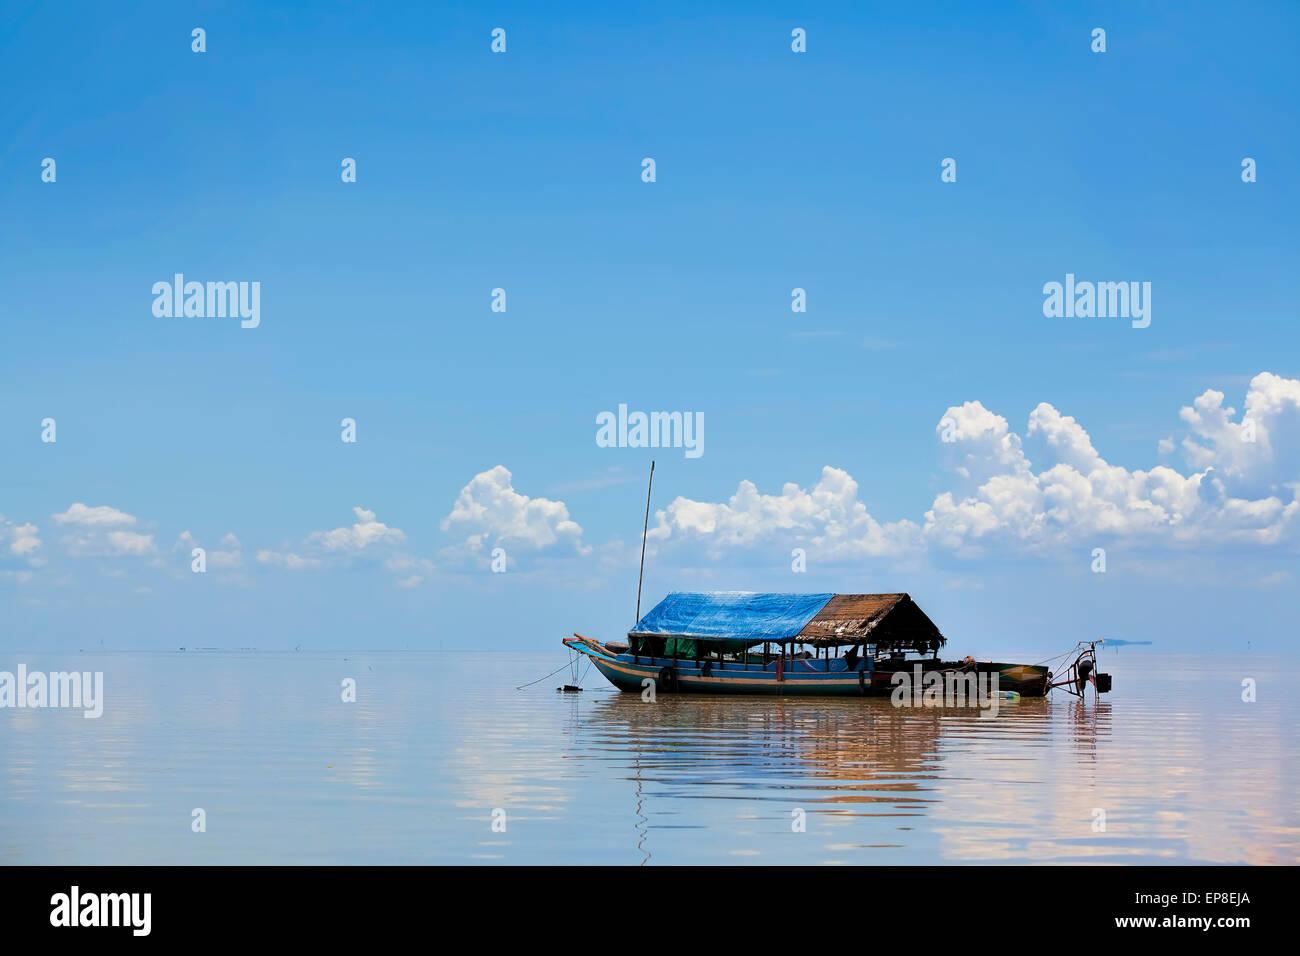 Floating village - Stock Image